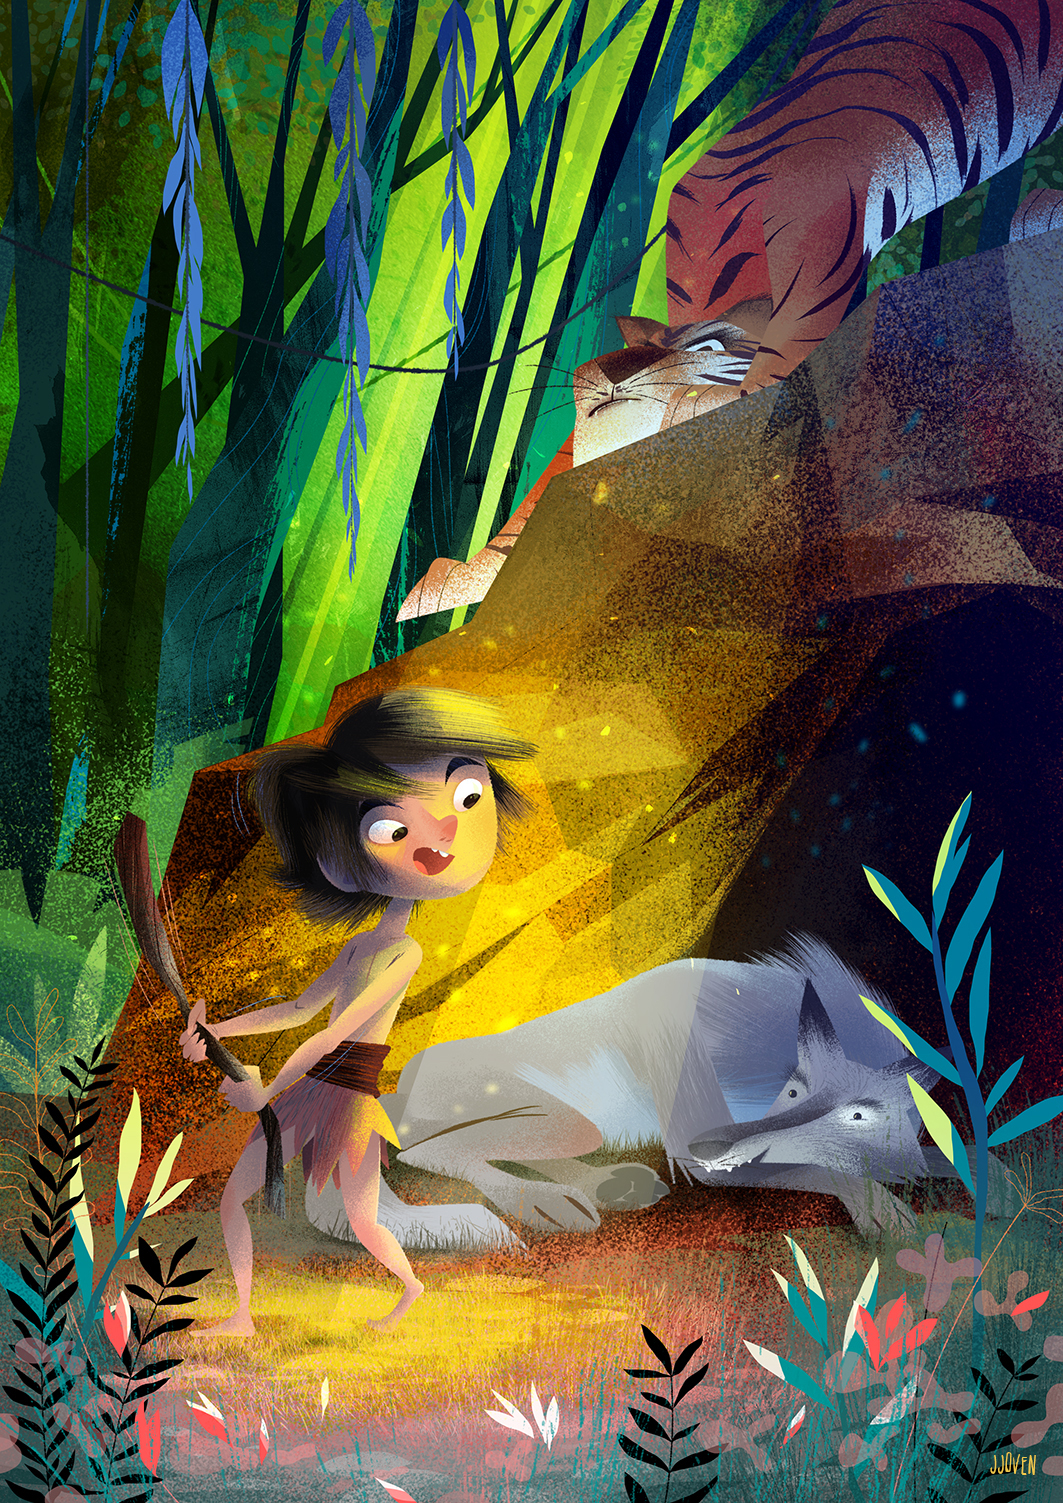 children´s book jungle book mowgli wolf tiger kidlit Author digital 2D